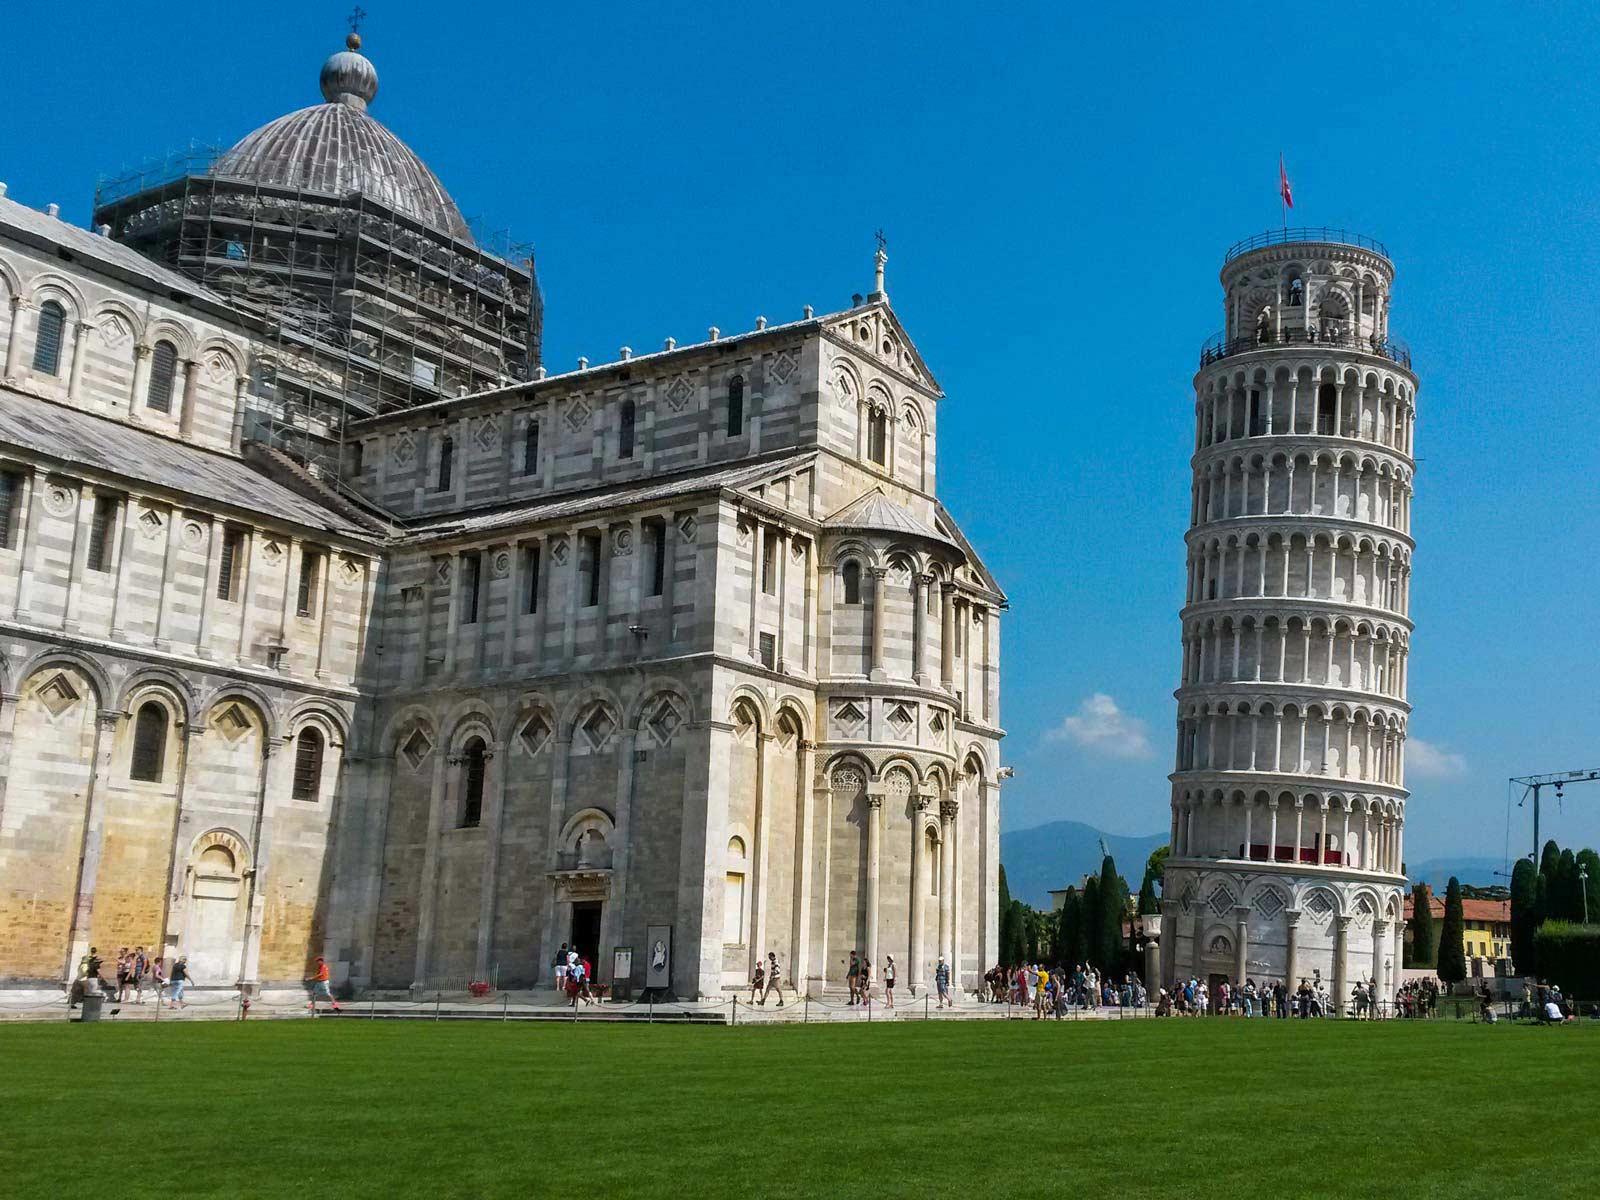 Pisa schiefer Turm